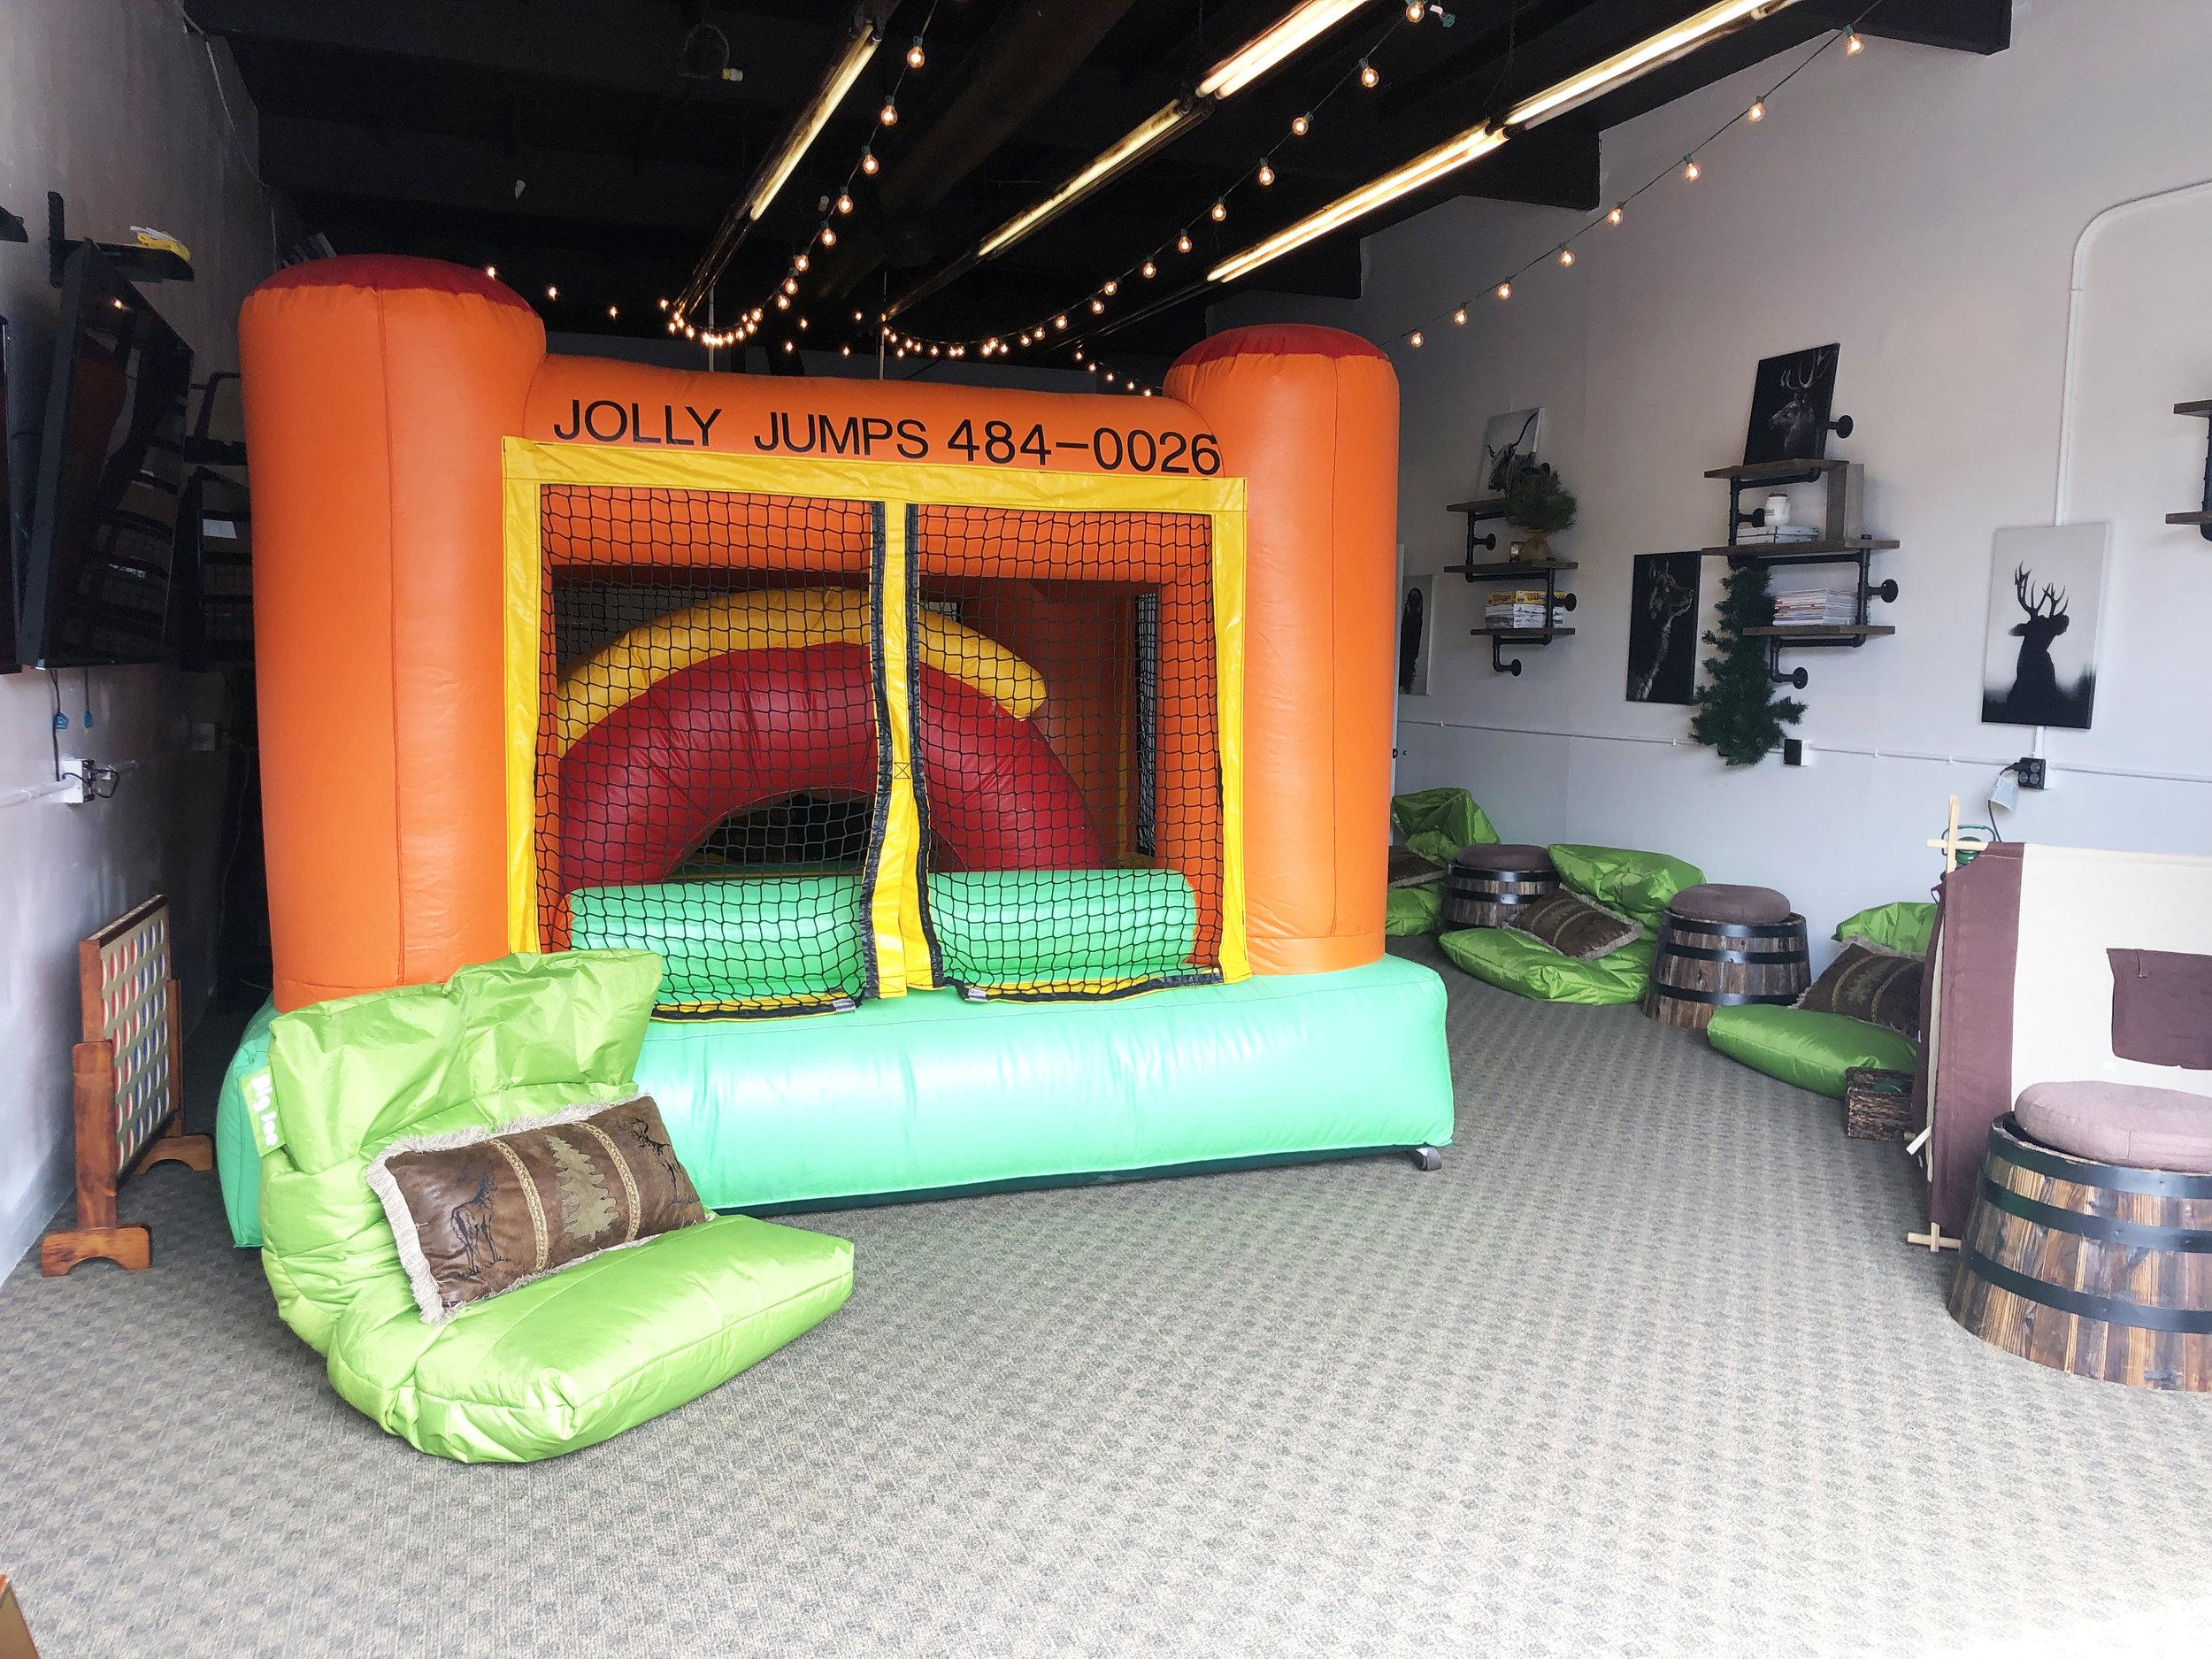 Jolly Jumps bounce house setup at The Papa Saloon